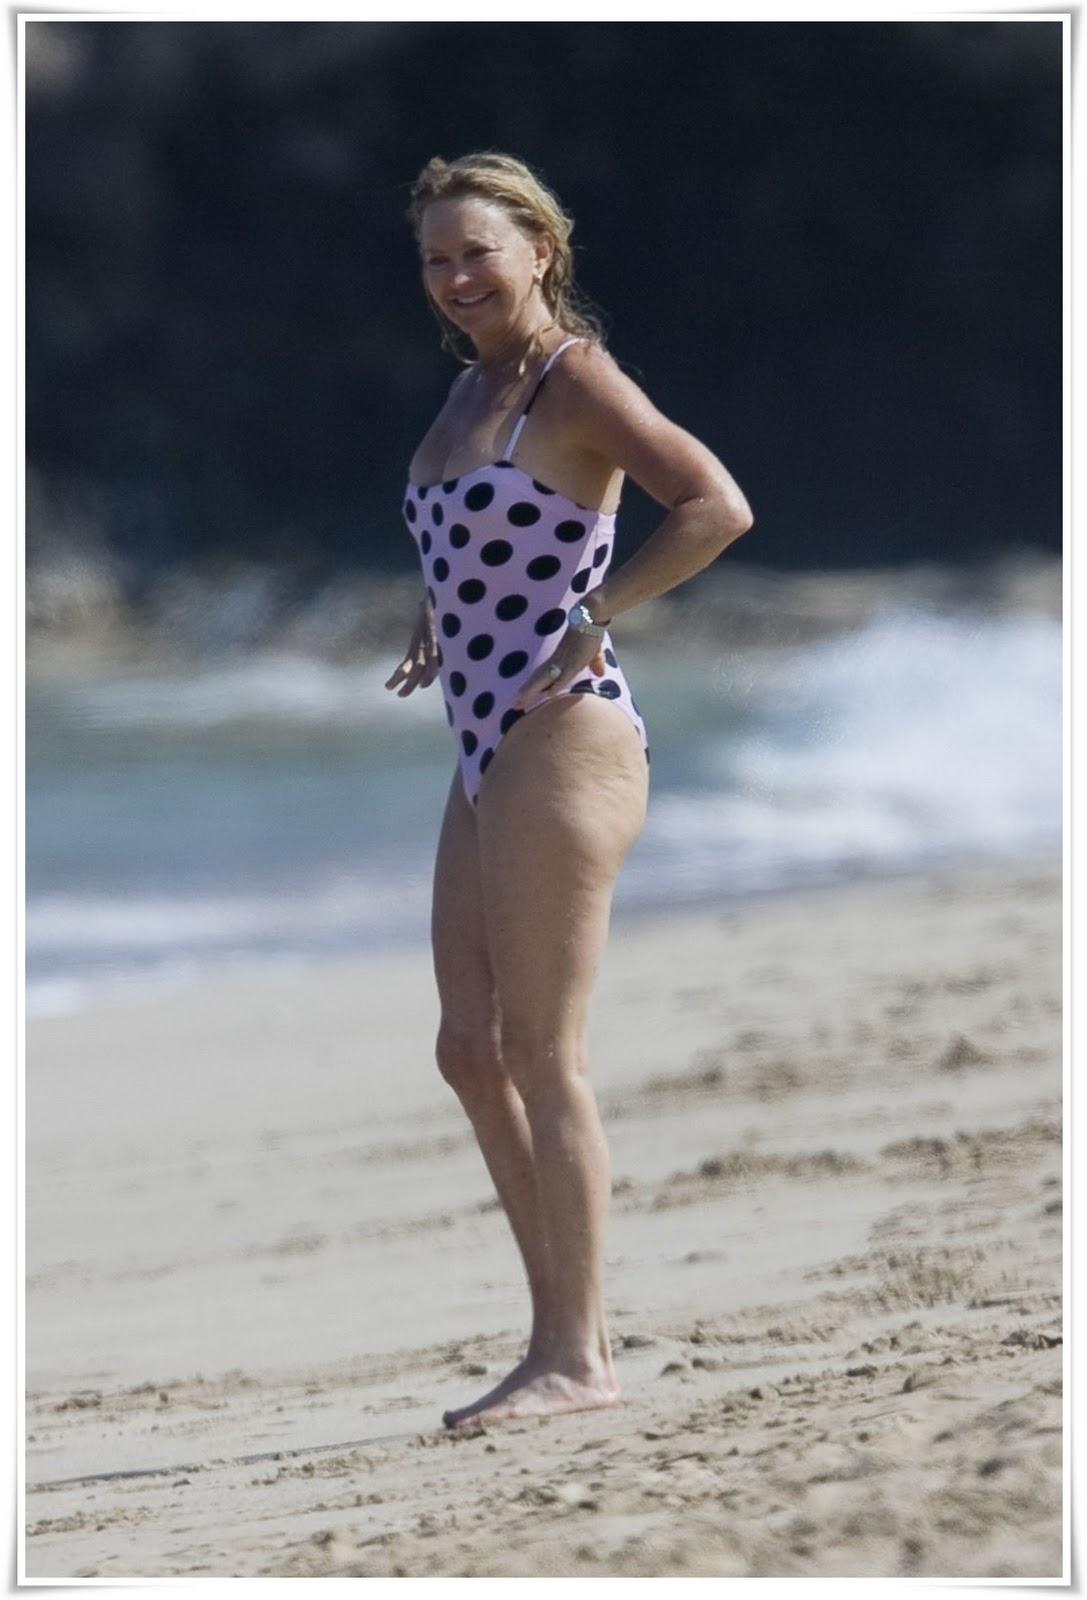 http://3.bp.blogspot.com/_cNo_aOISmn8/TFFGh8IgJnI/AAAAAAAAAHI/BDGbVH_5keU/s1600/goldie_hawn_swimsuit_5_big.jpg